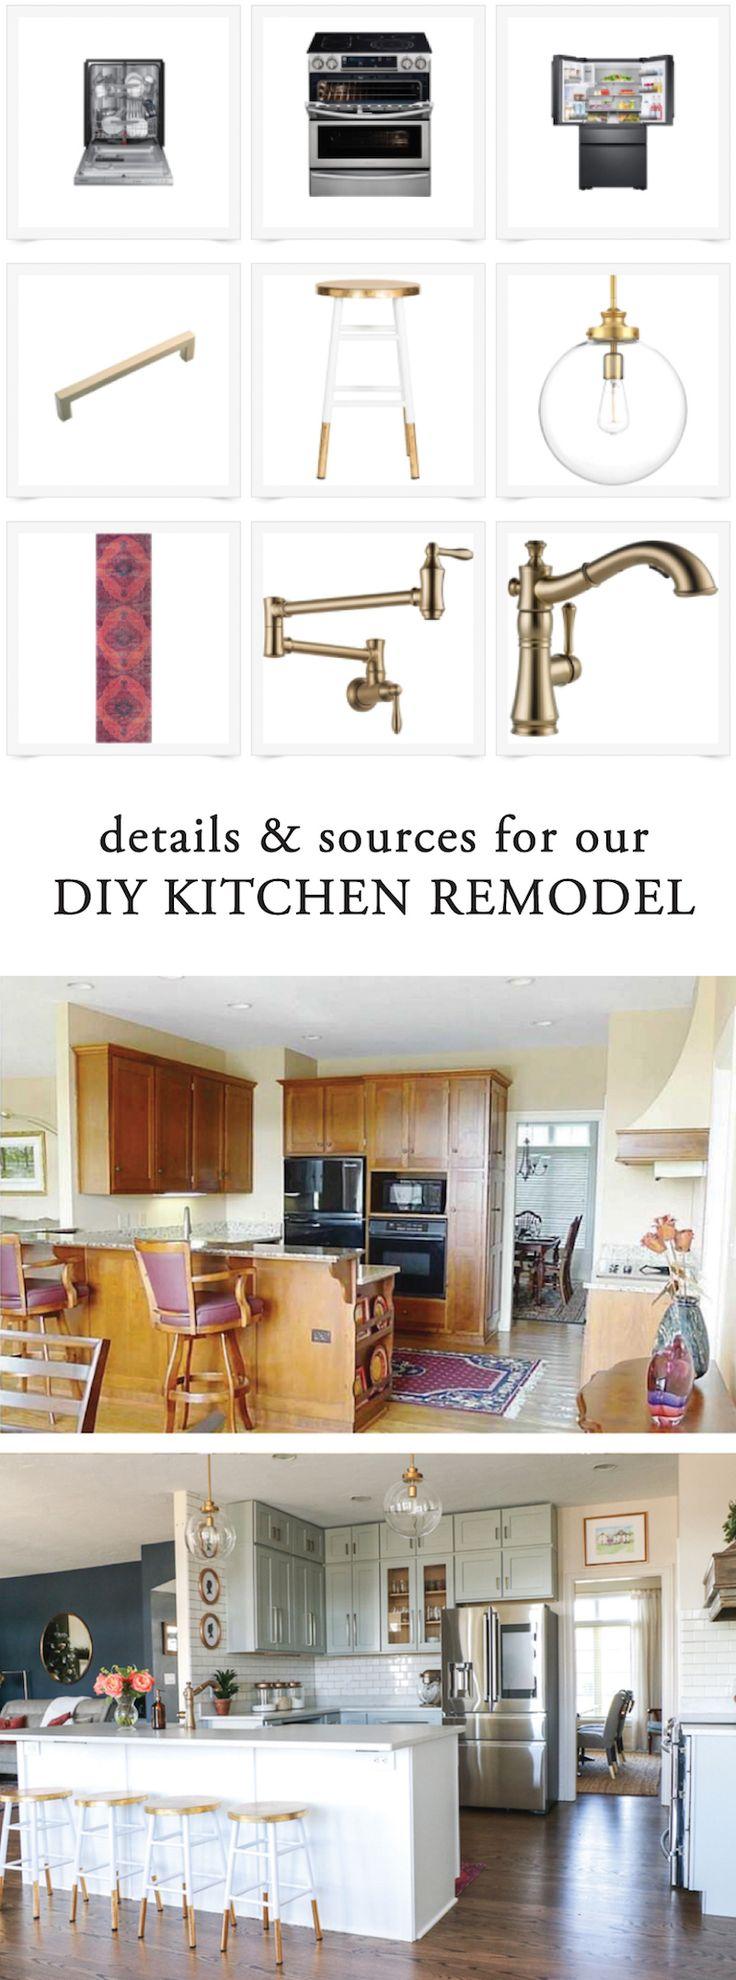 1040 best Kitchens images on Pinterest | House decorations ...